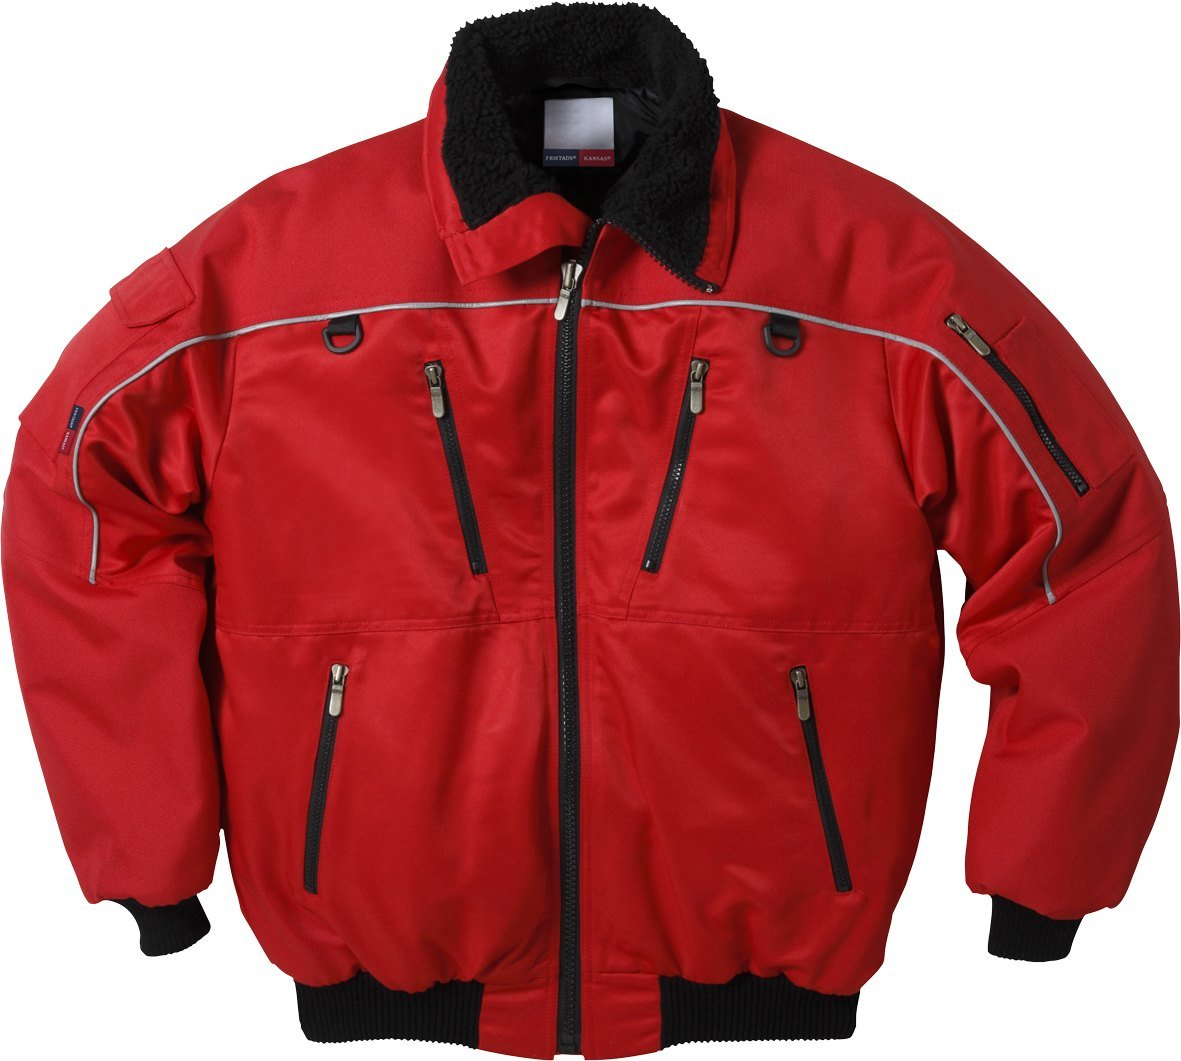 Fristad Kansas - Pilot jacket 464 PP XX/Large Red 100498-331 2XL